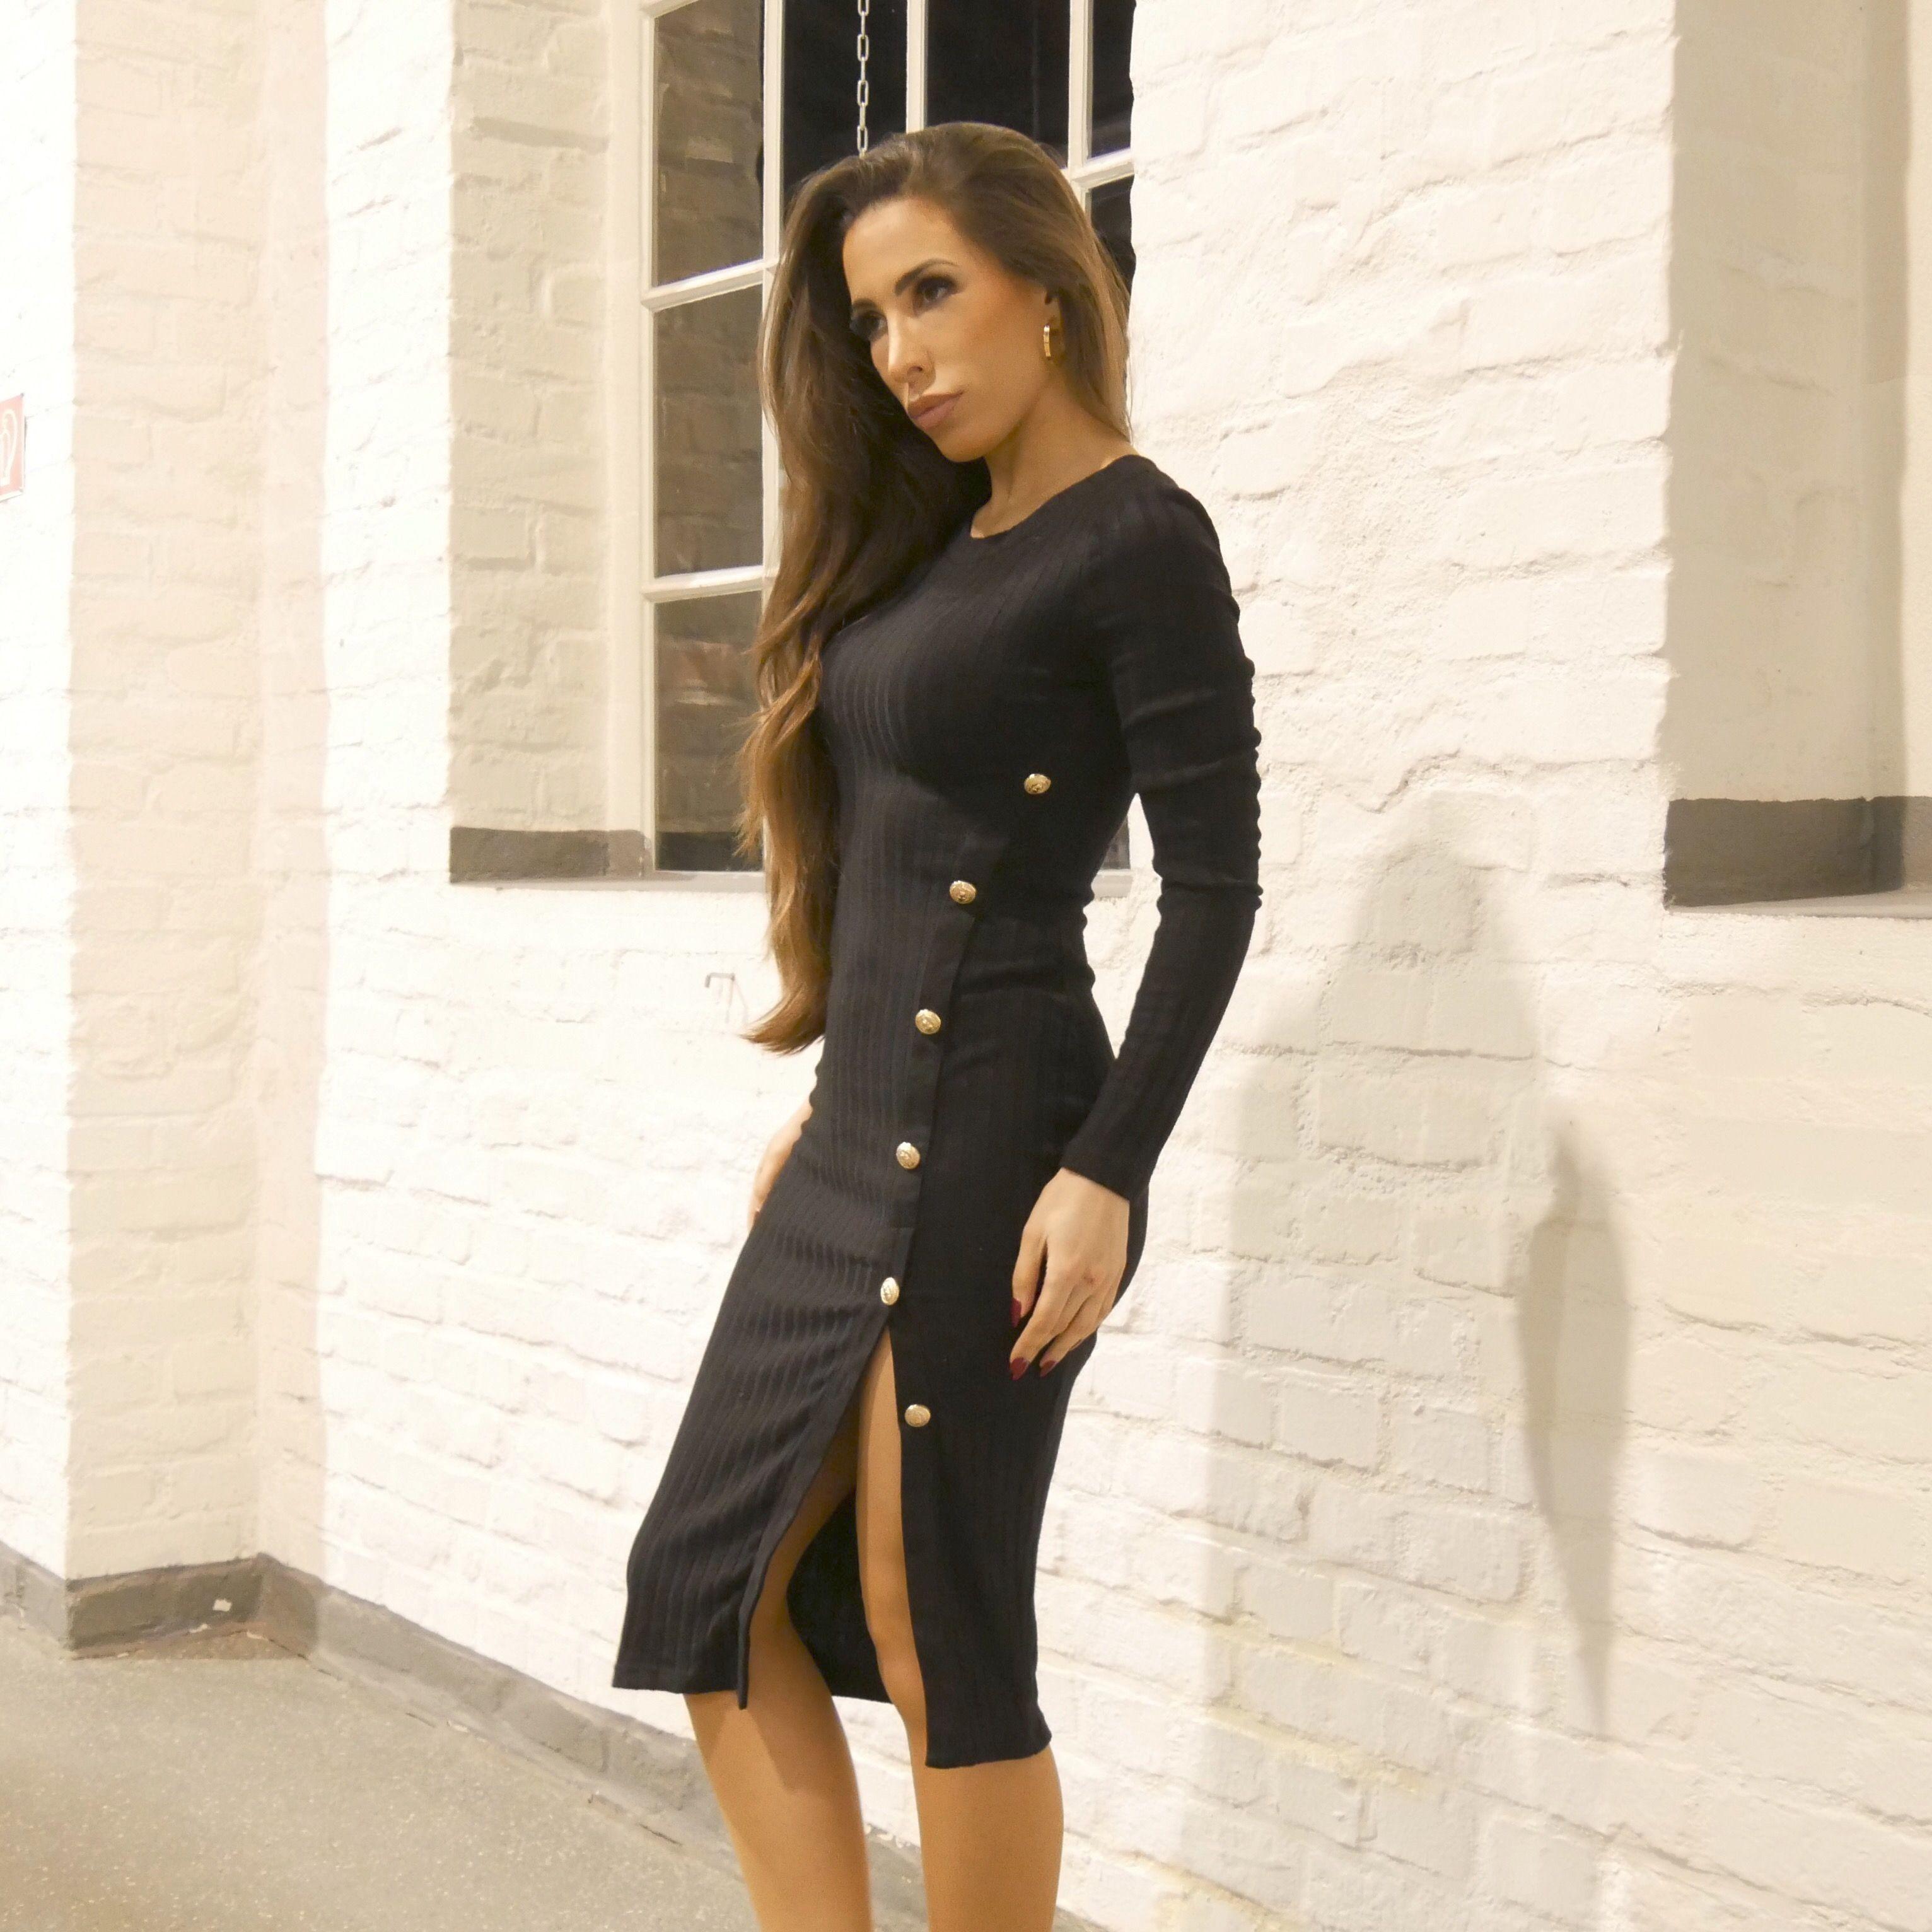 starlet store 39 palazzo 39 dress black 59 90 schwarz abendkleid kurzes kleid pailletten. Black Bedroom Furniture Sets. Home Design Ideas